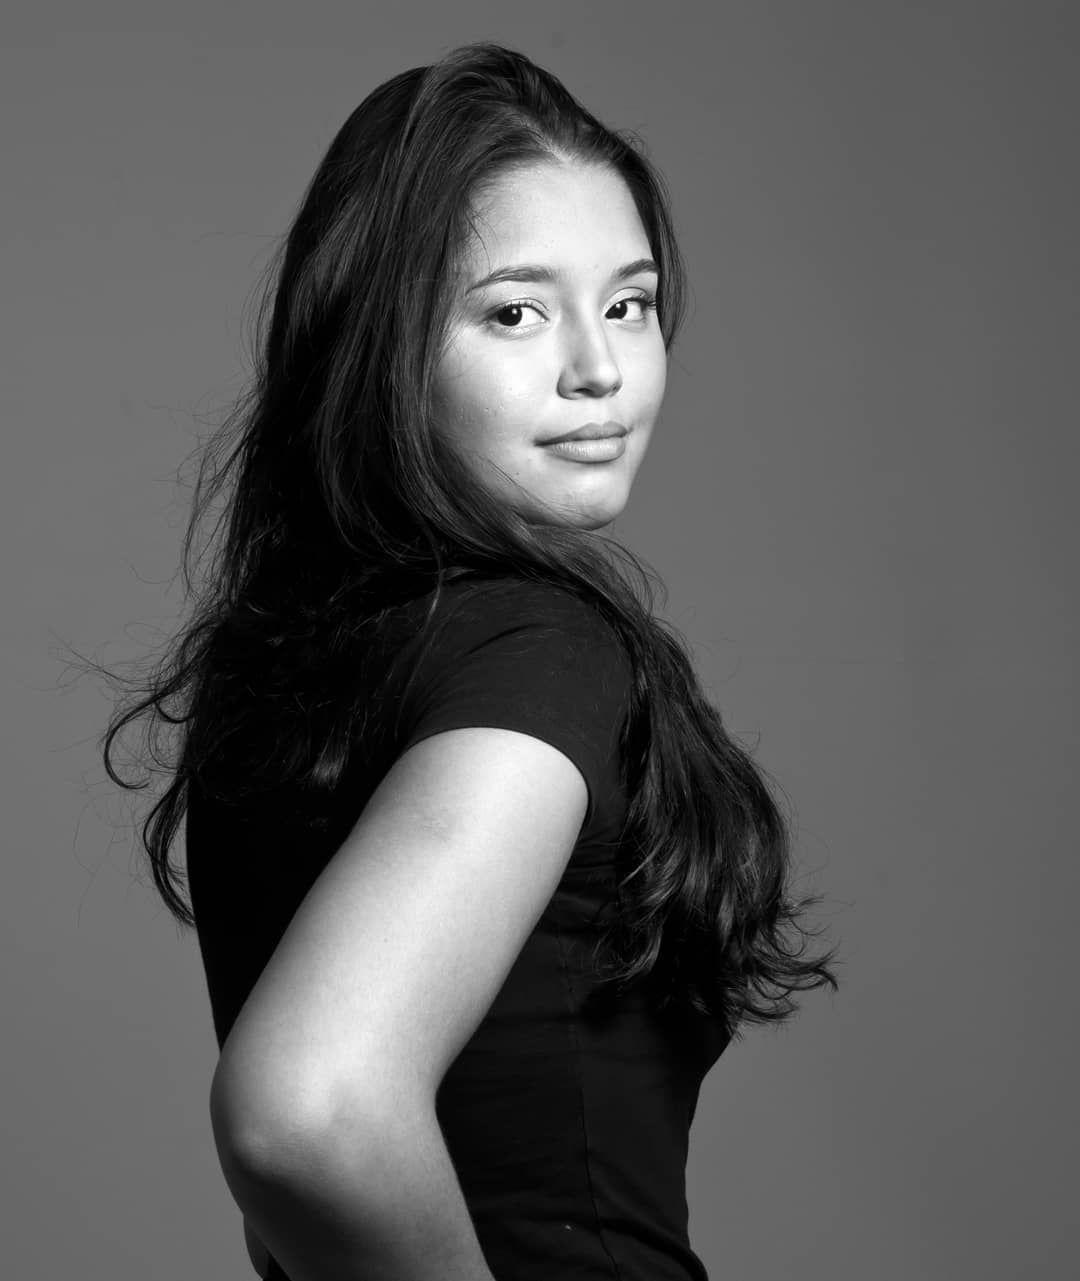 10bfd1c97 Larissa Malheiros Araujo Idade  19 anos Altura  1